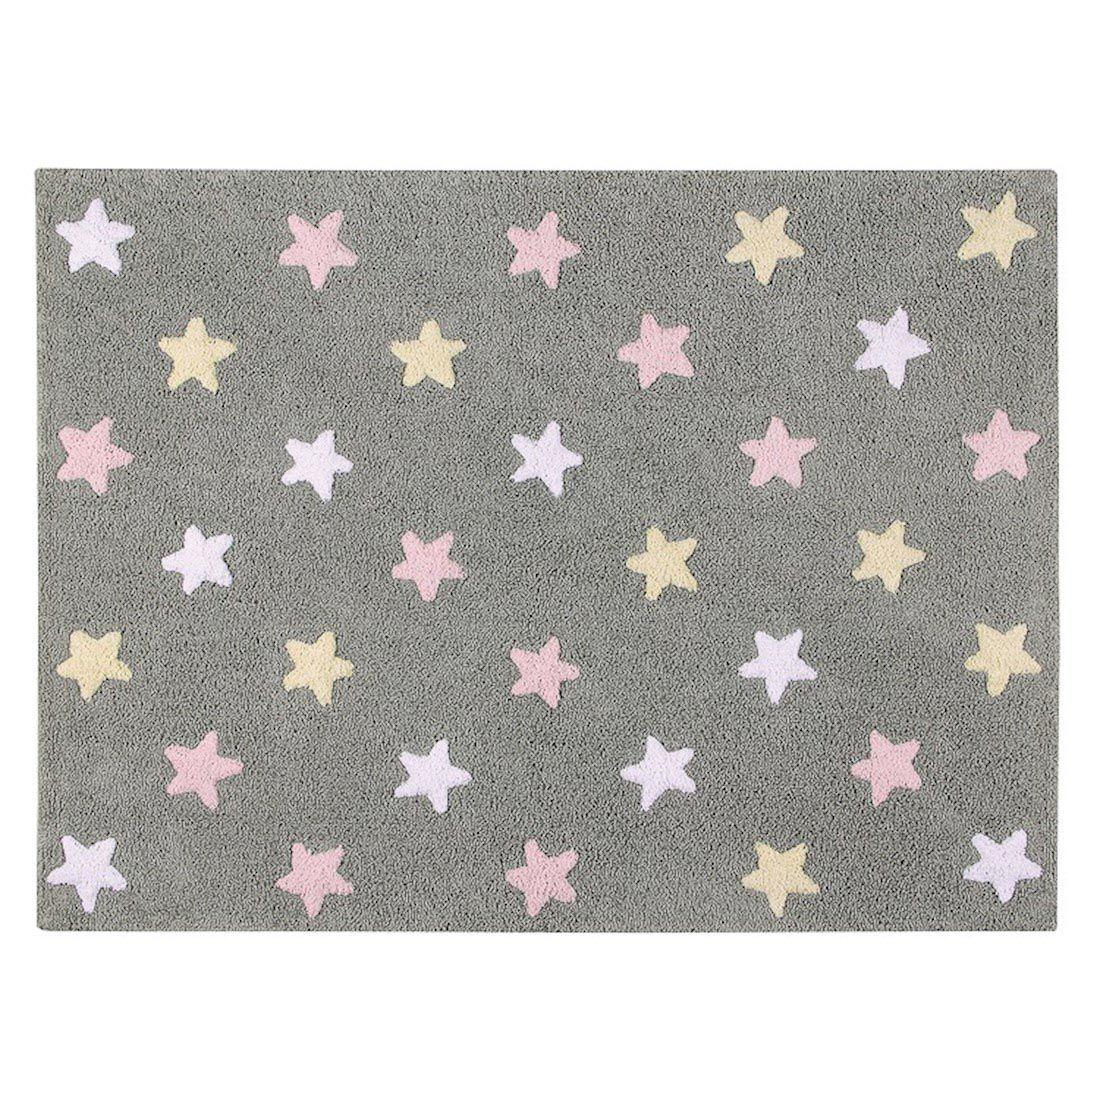 Tapete Lorena Canals Estrelas Tricolor Cinza- Rosa 120 x 160 cm